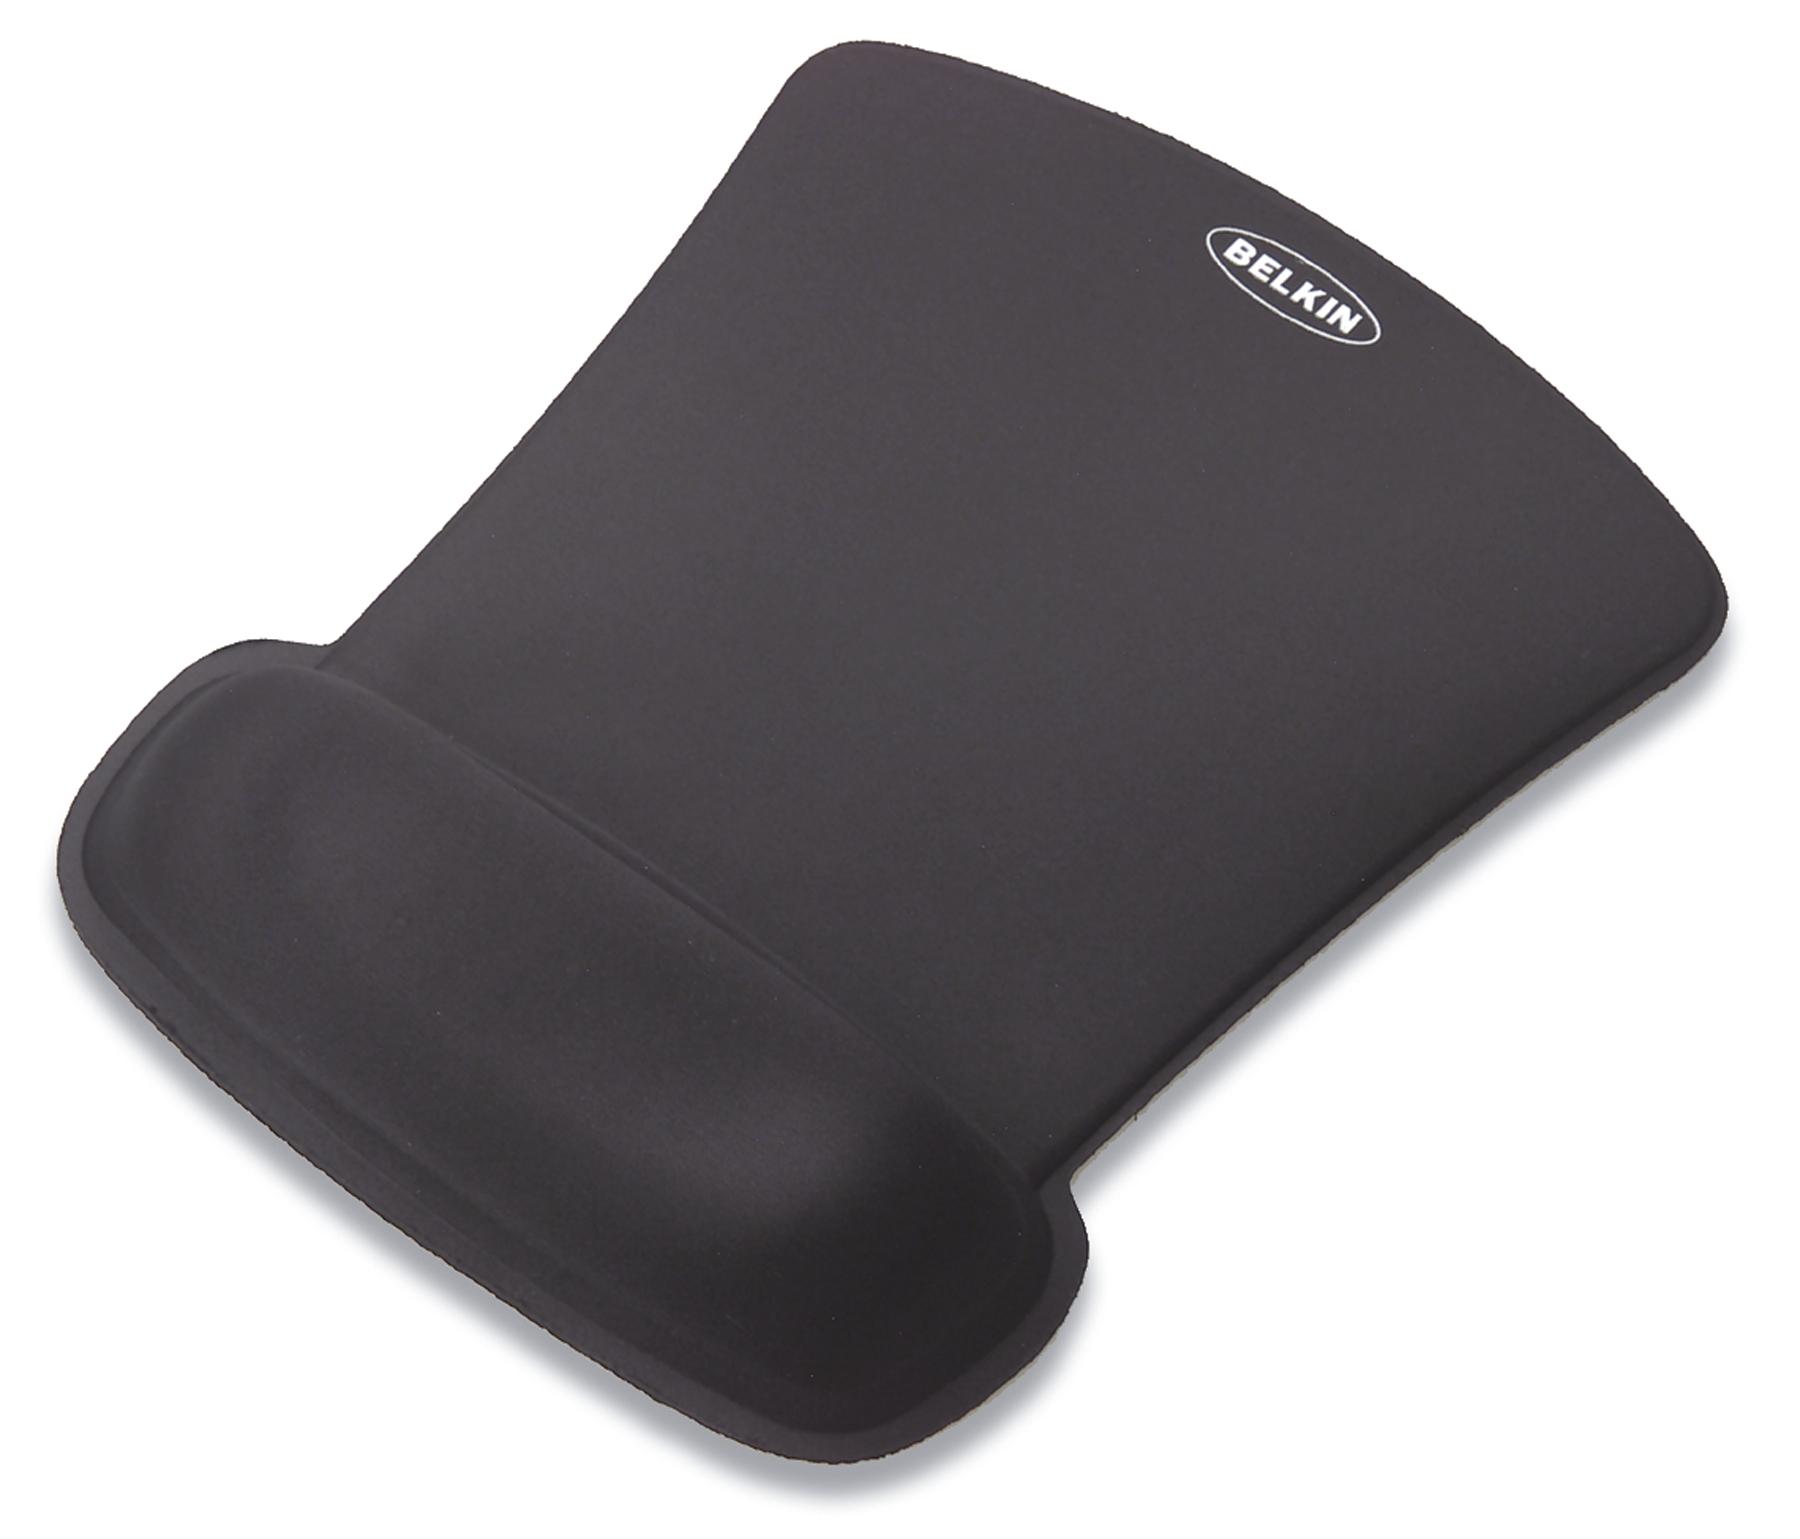 Belkin Pad Mouse Gelflex